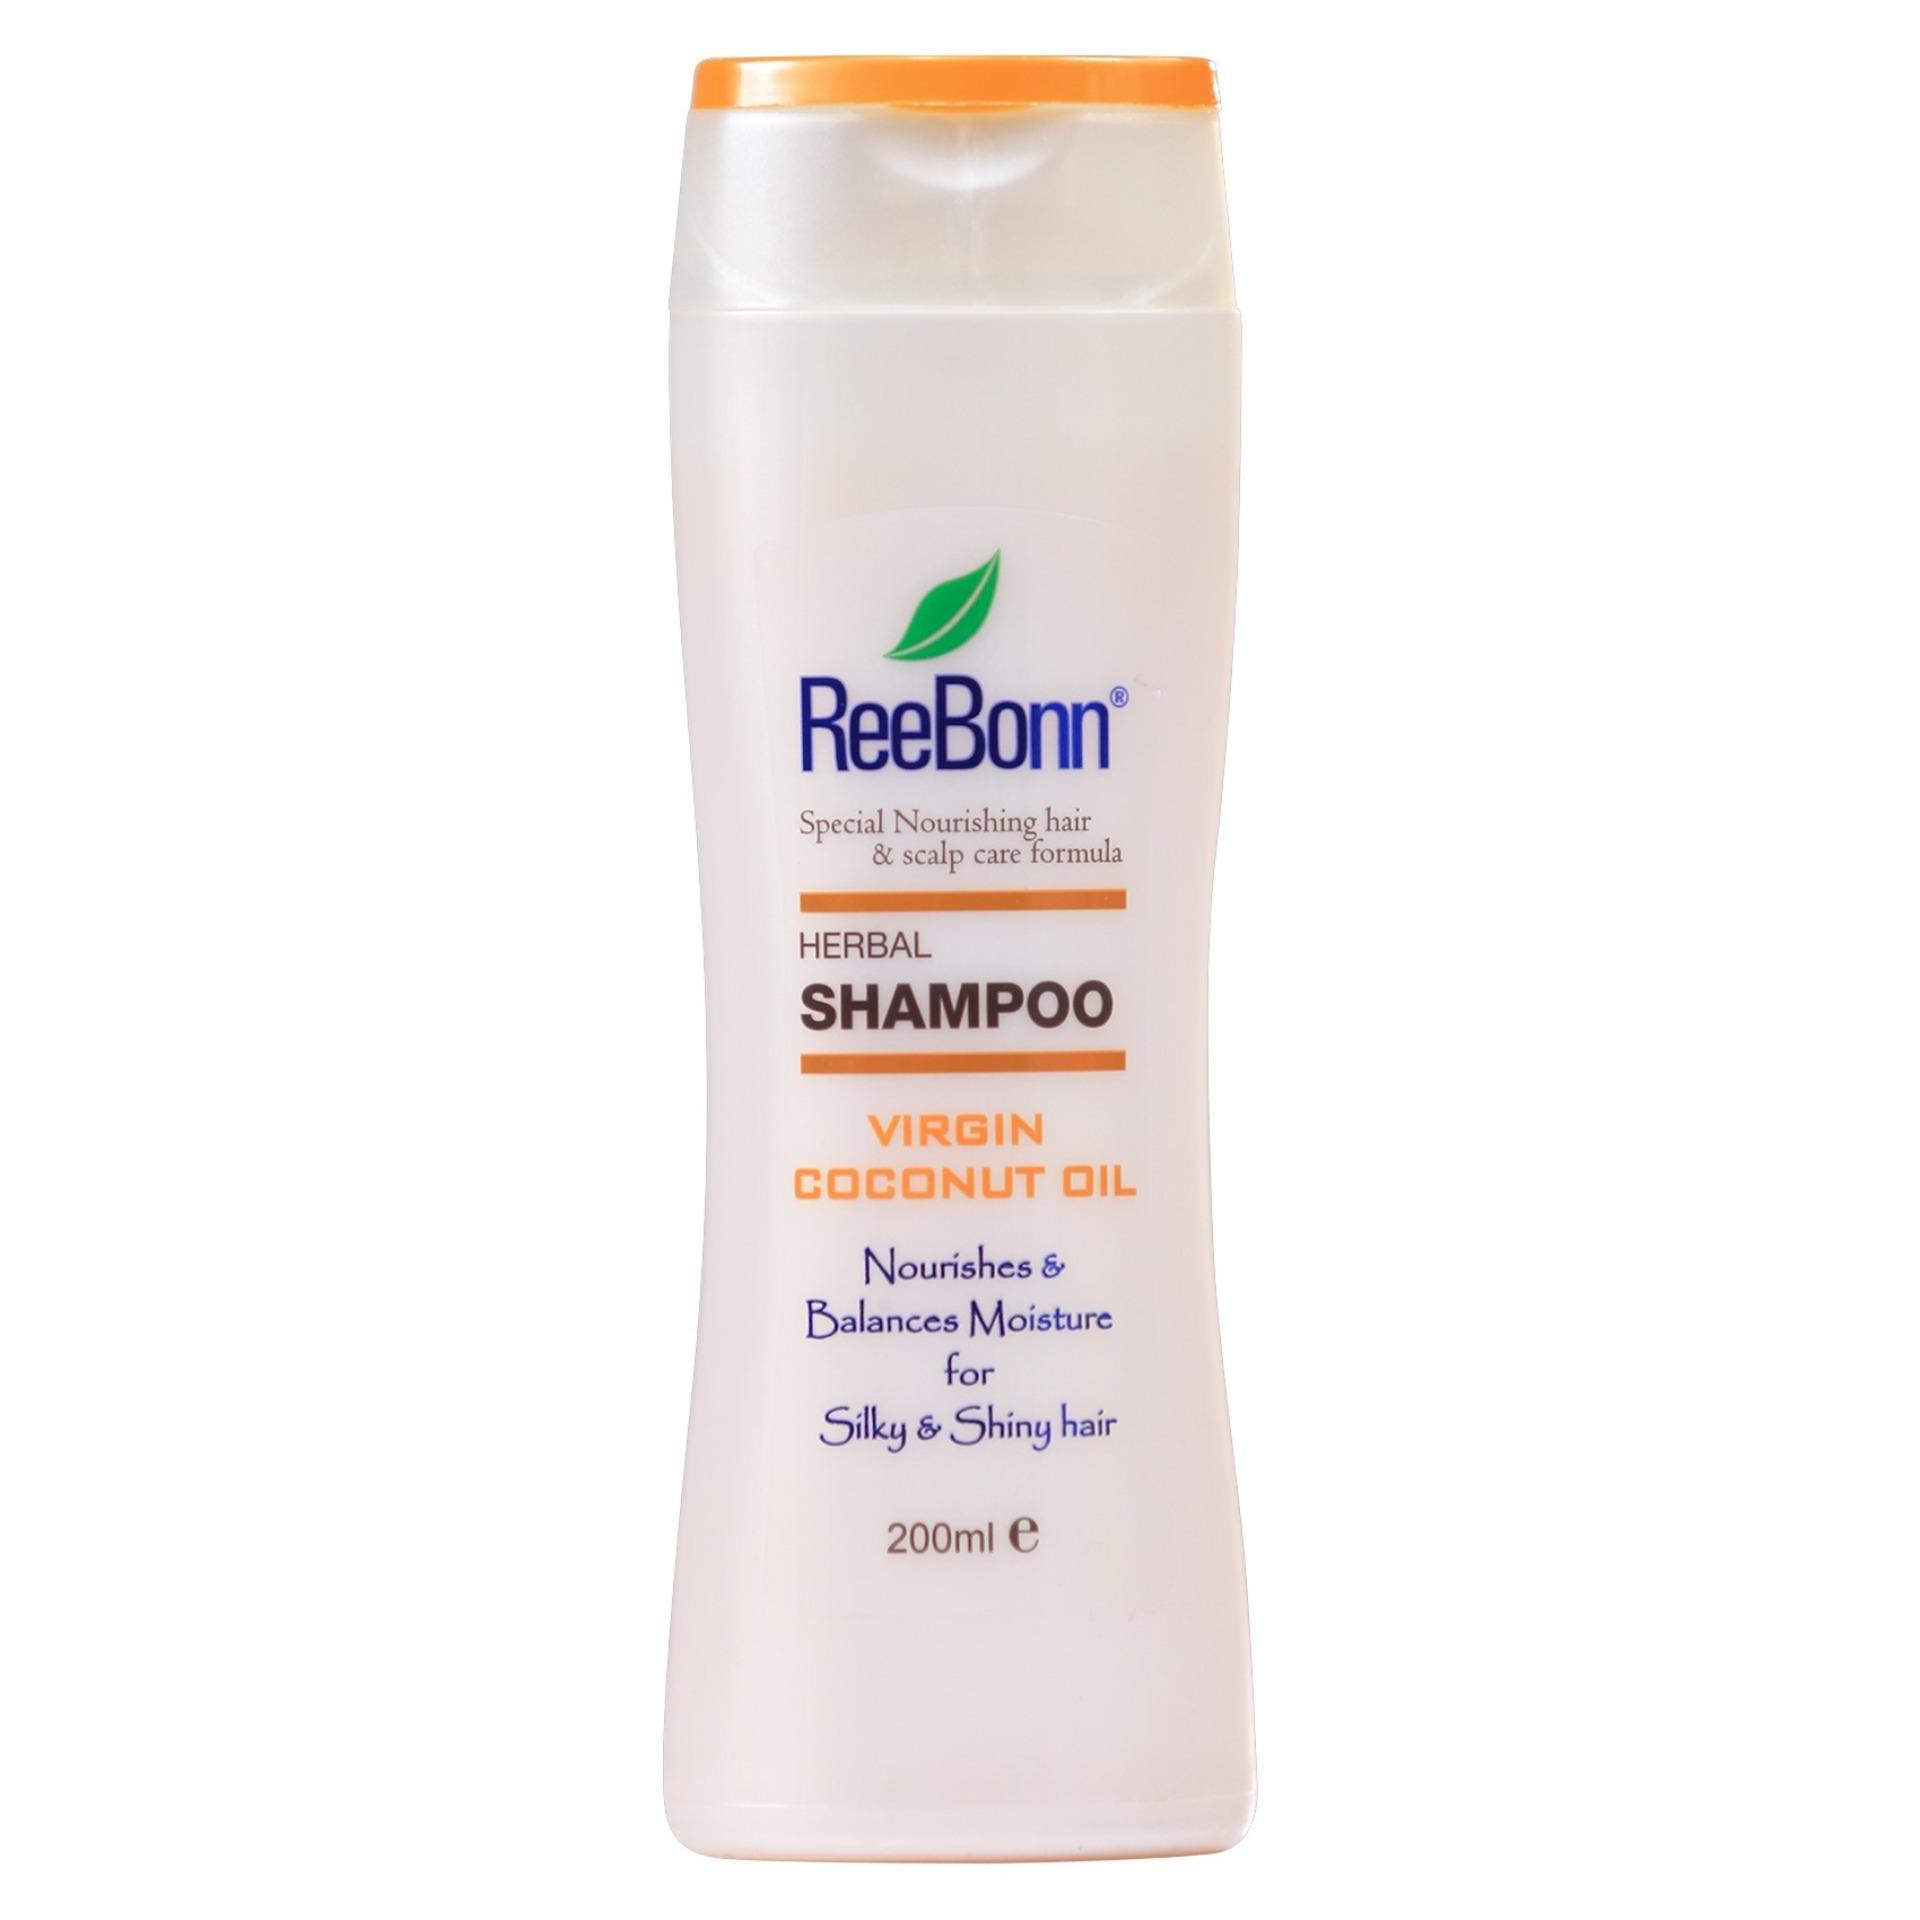 Herbal Shampoo Virgin Coconut Oil-200ml